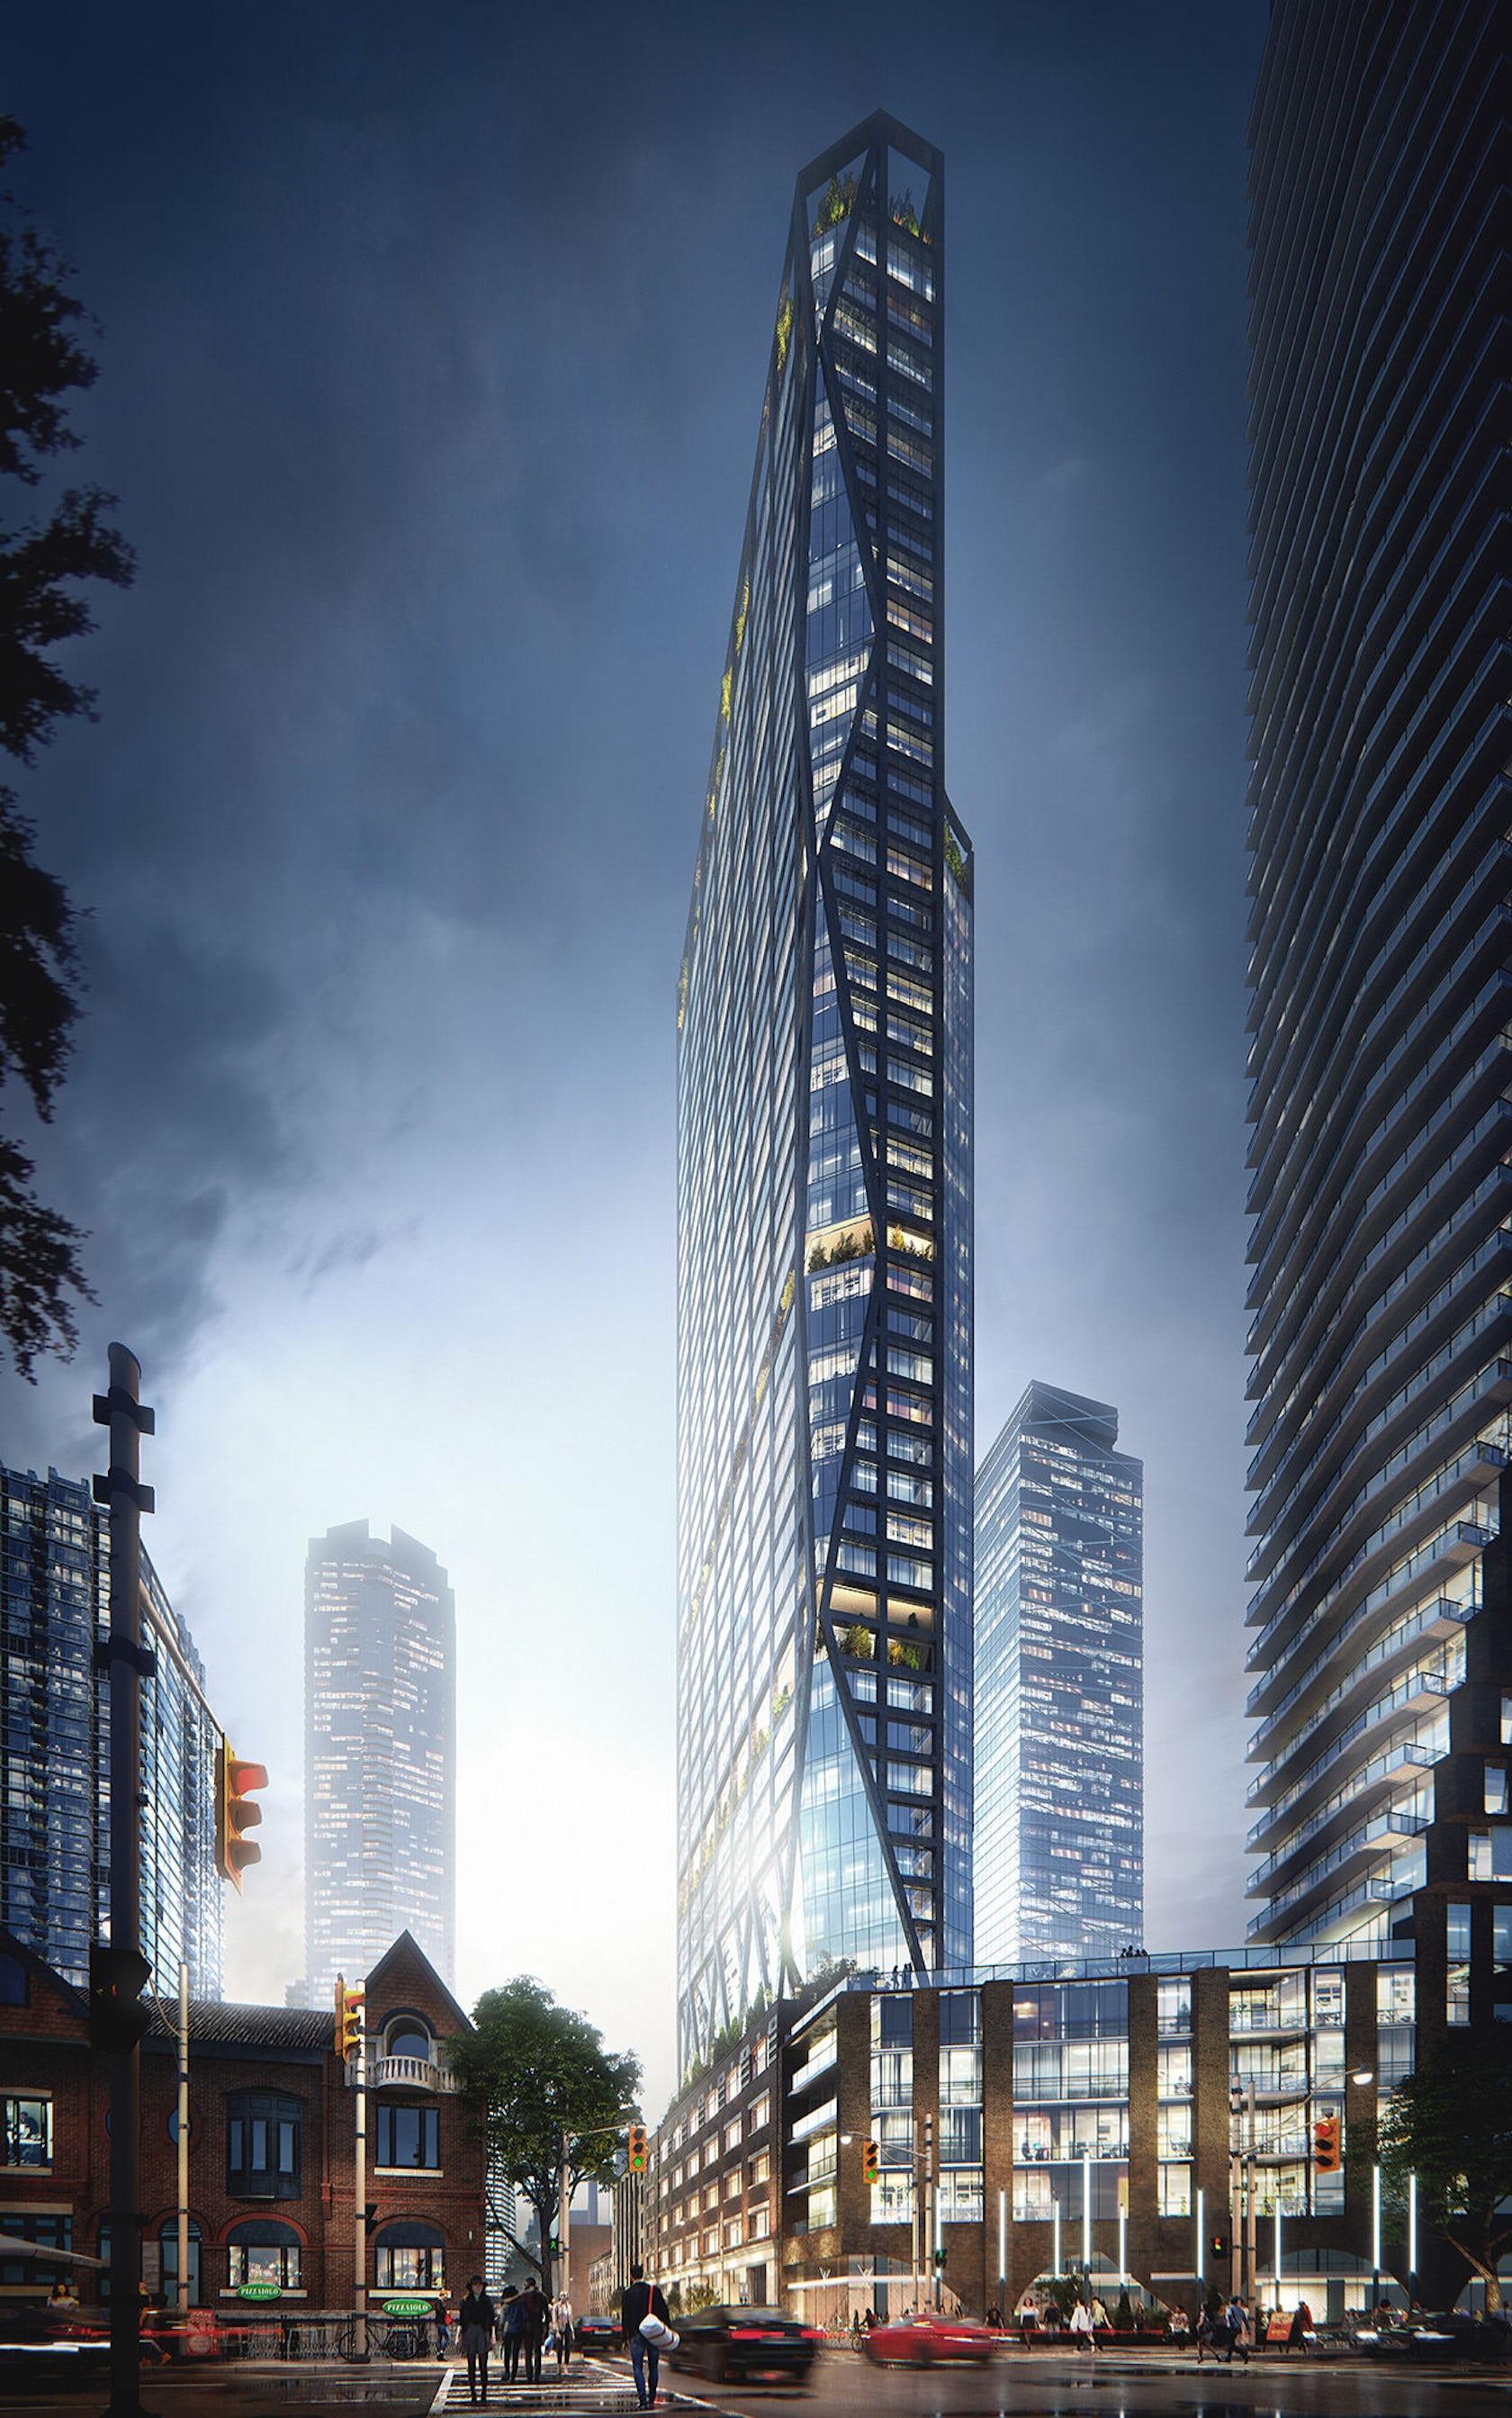 The Auto Palace >> Architectural Visualization of Skyscraper Project in ...